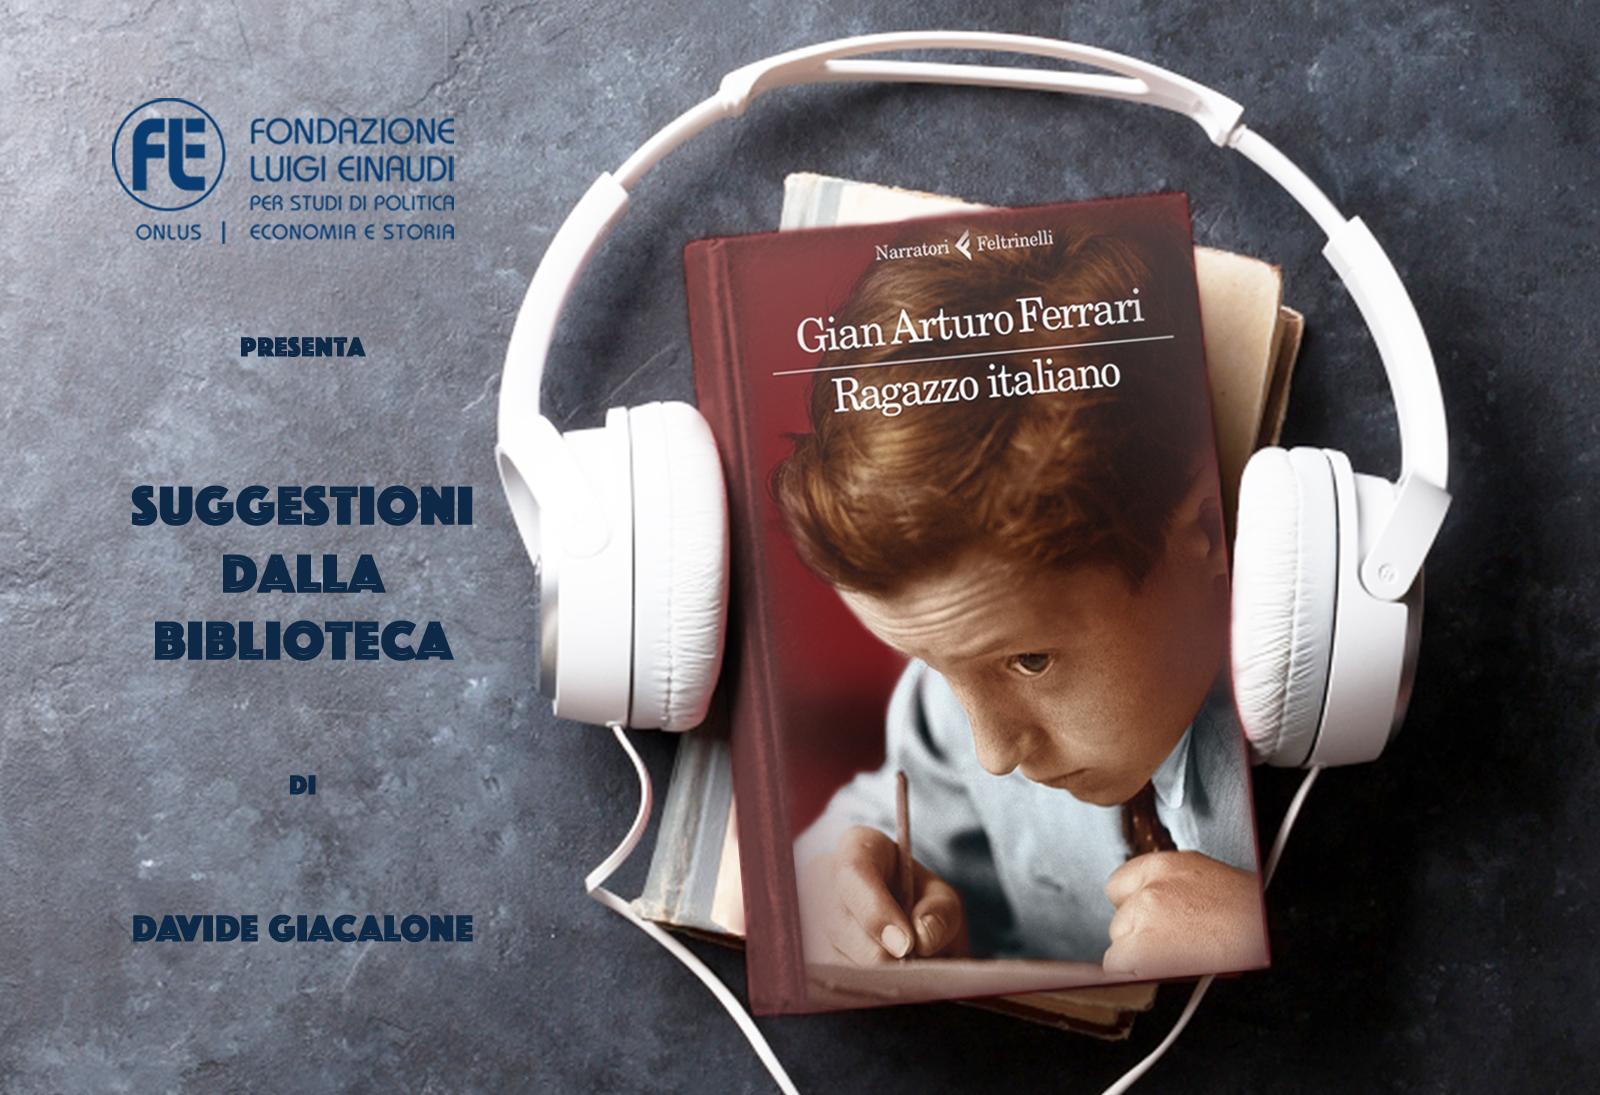 Gian Arturo Ferrari – Ragazzo italiano